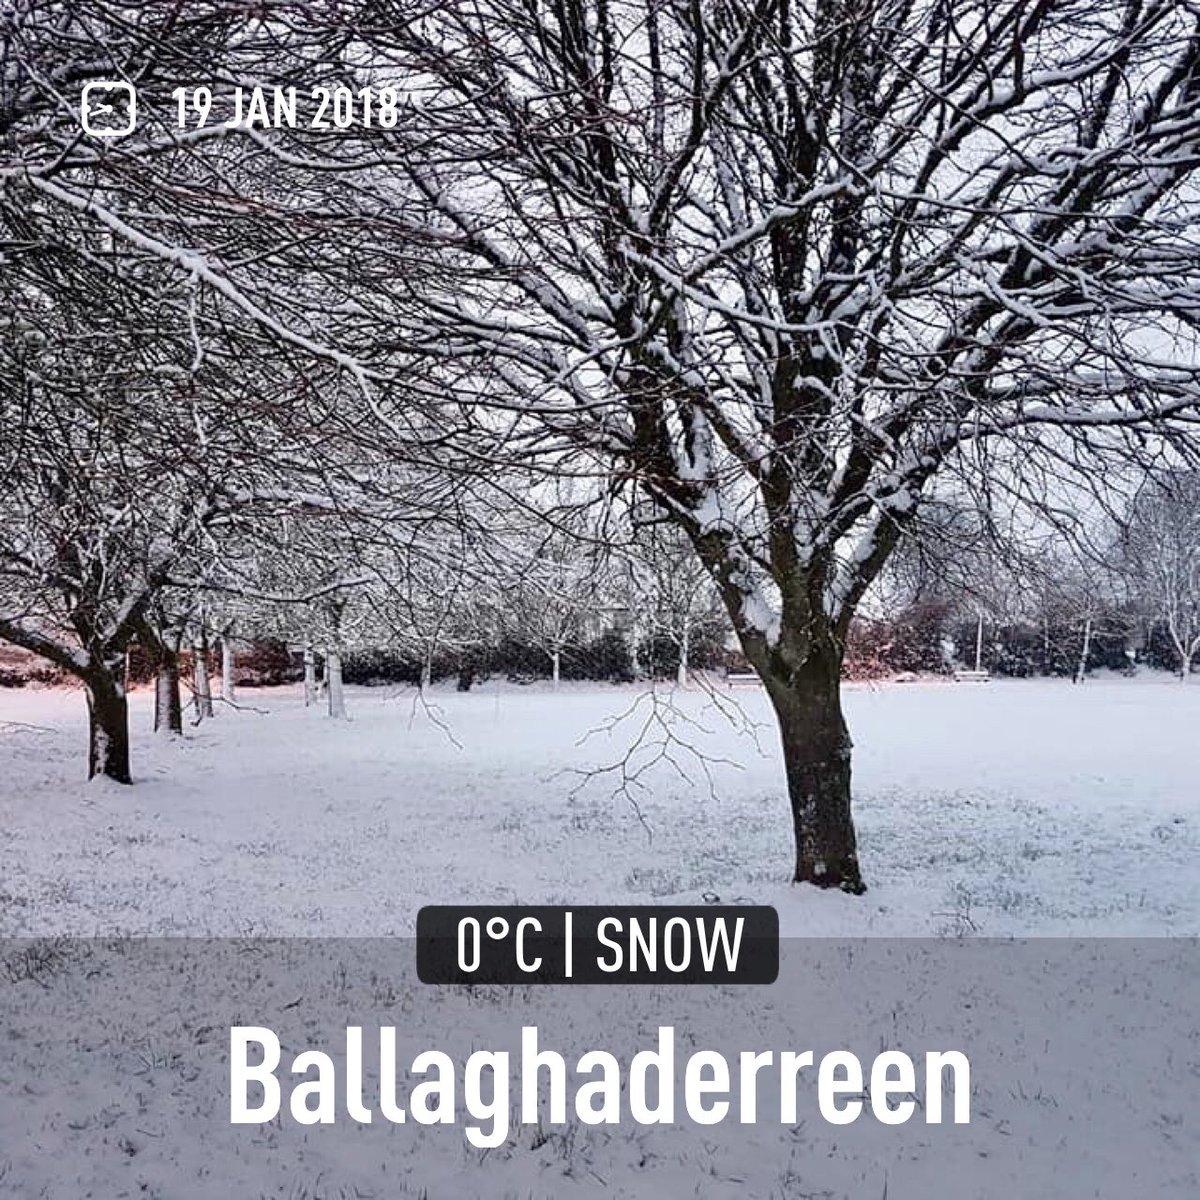 Ballaghaderreen